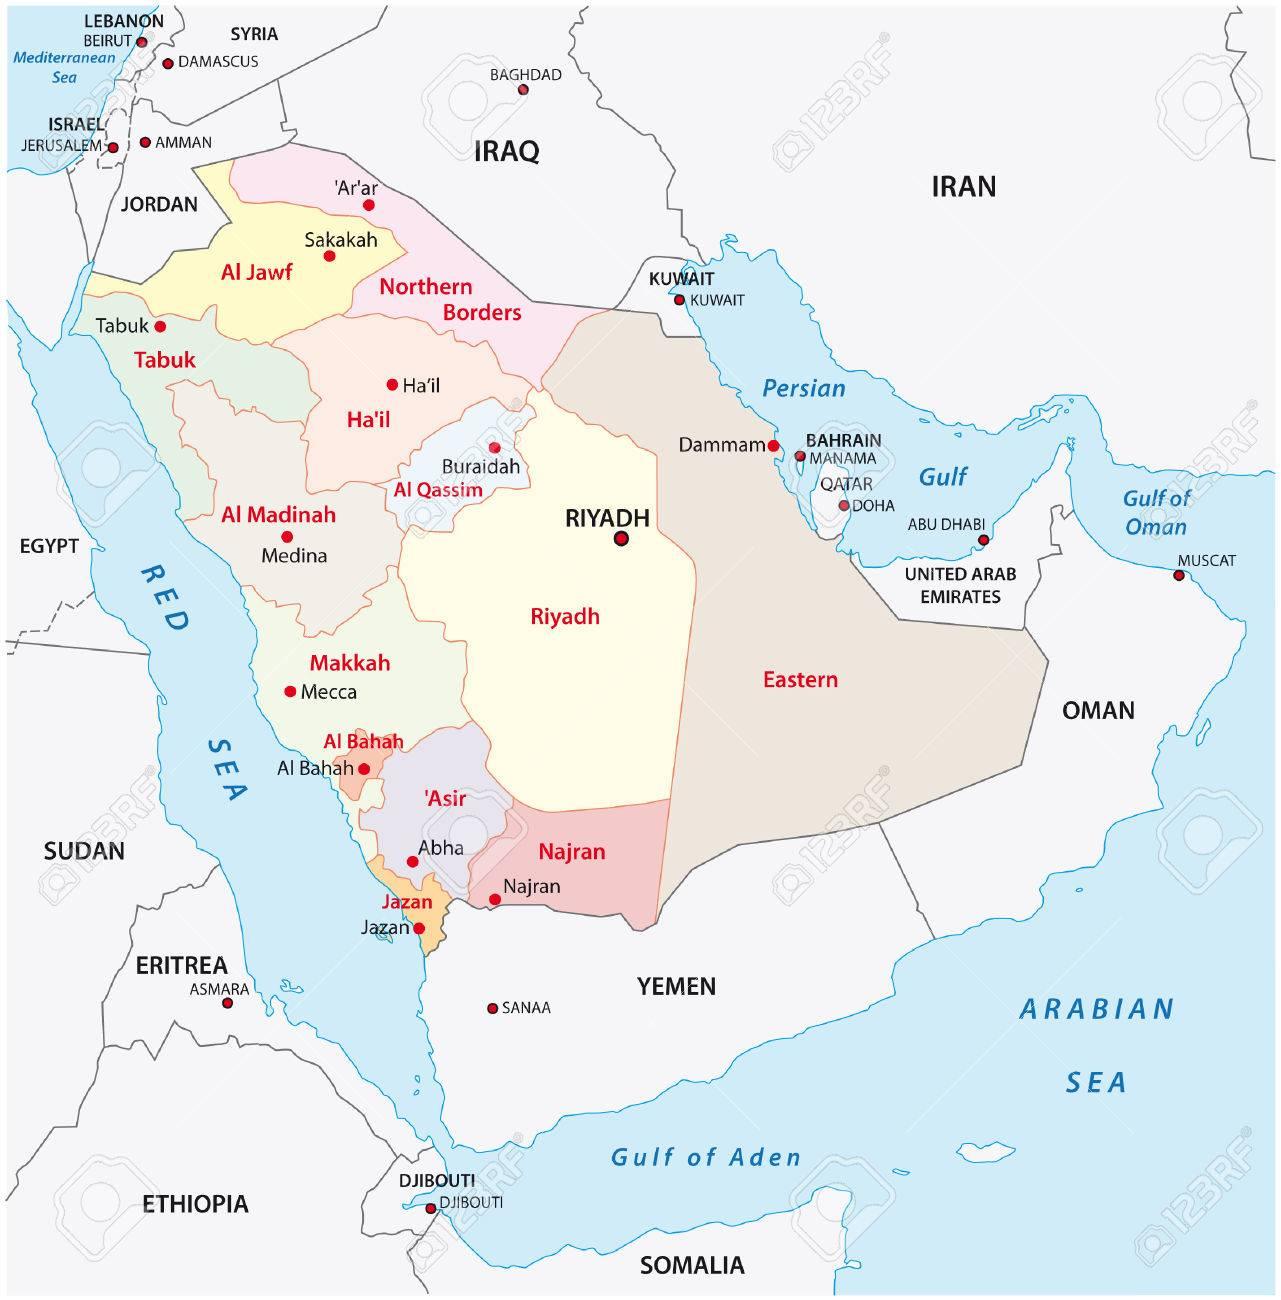 Saudi Arabia Administrative Map Royalty Free Cliparts Vectors And